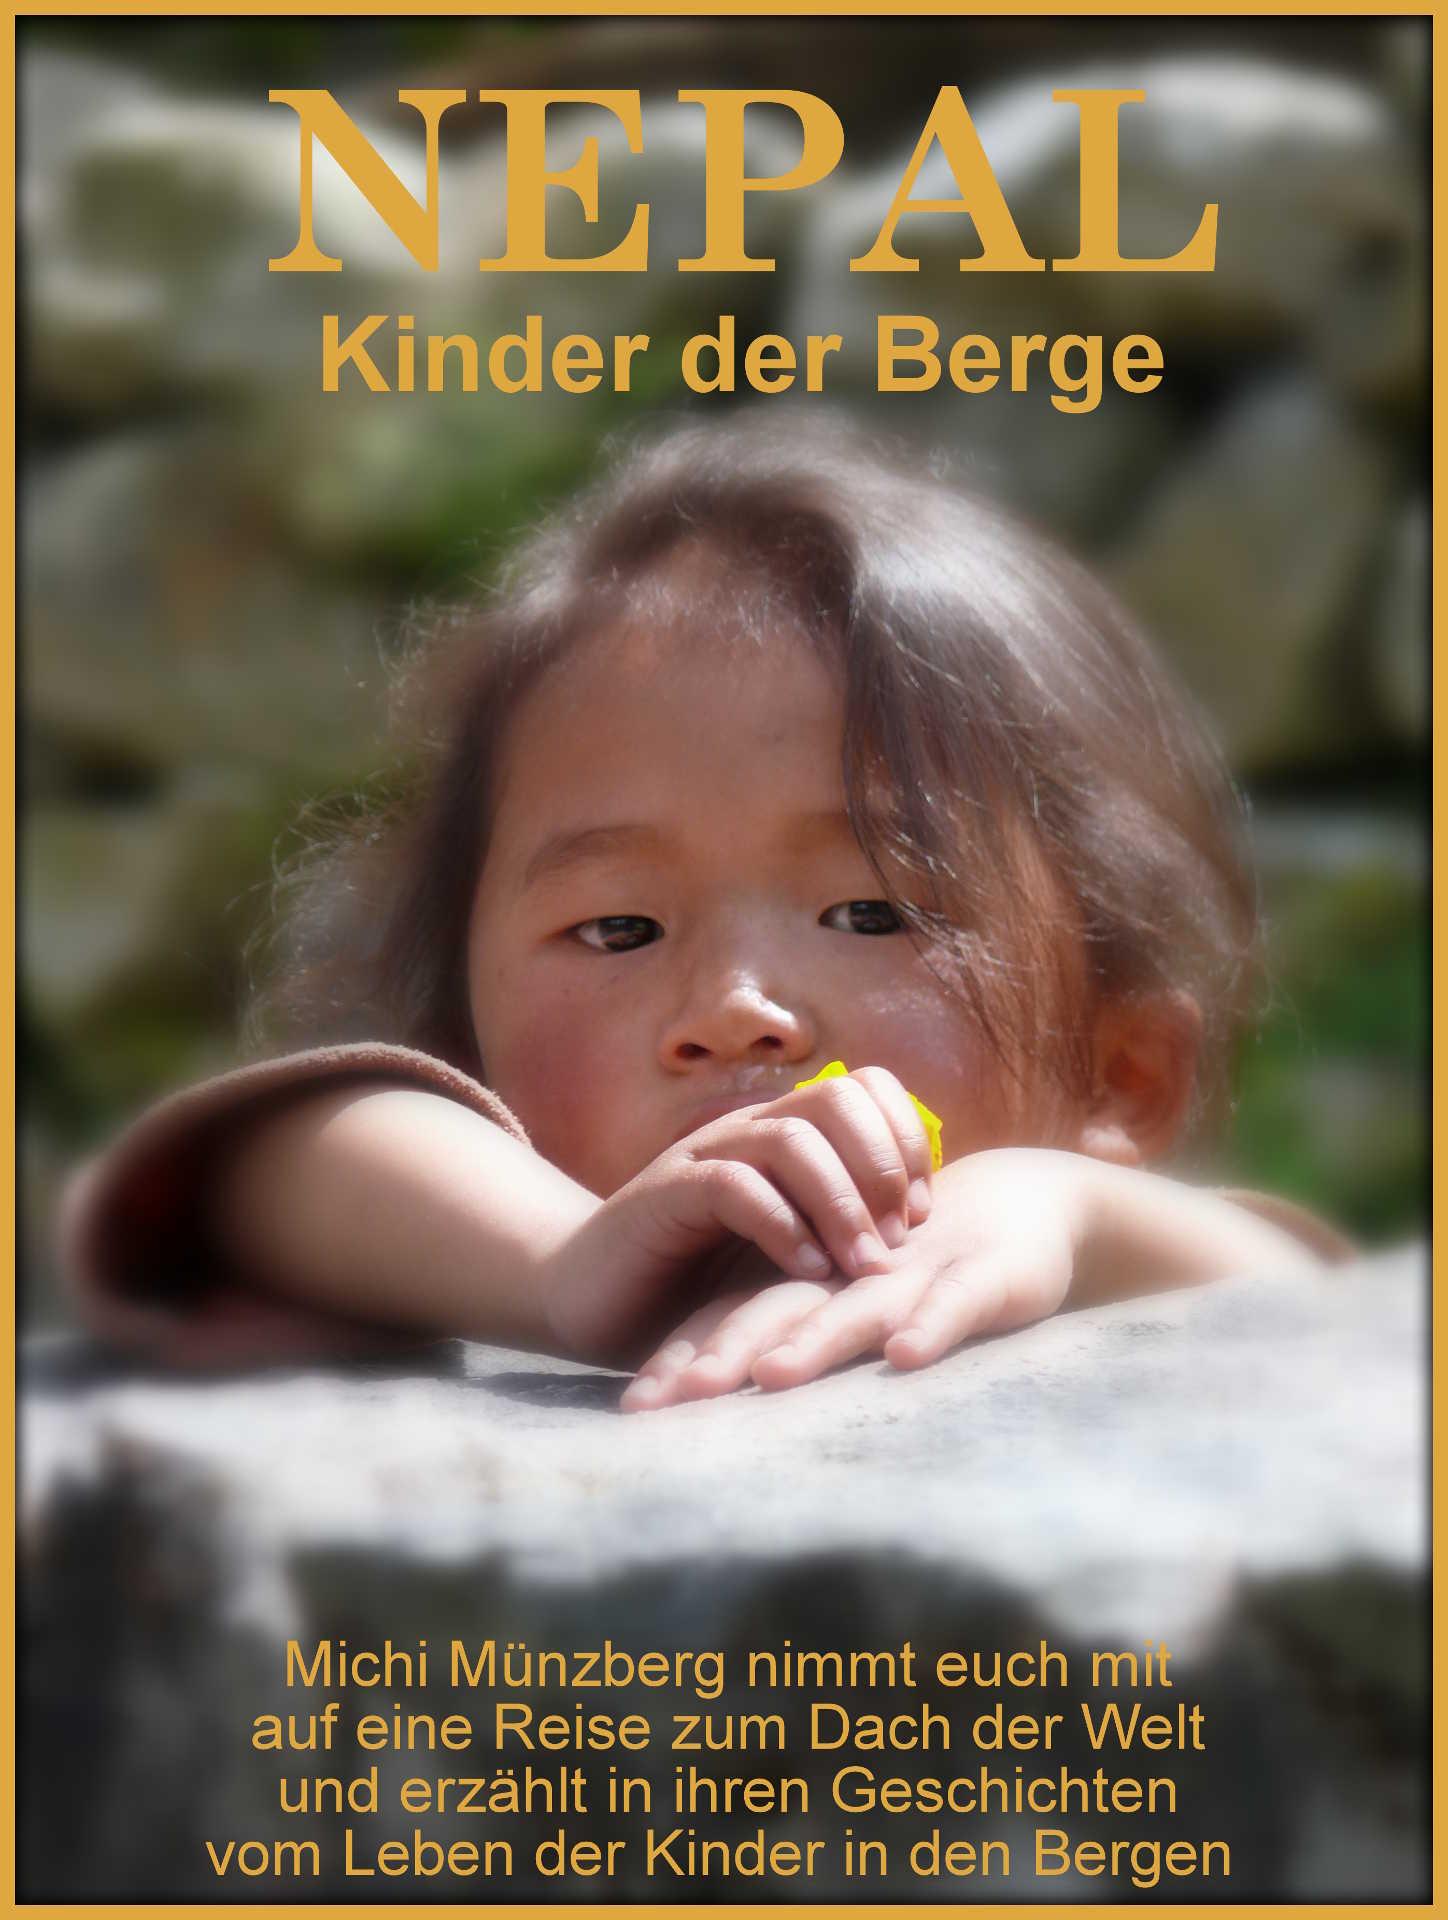 Kinder der Berge, Michi Münzberg